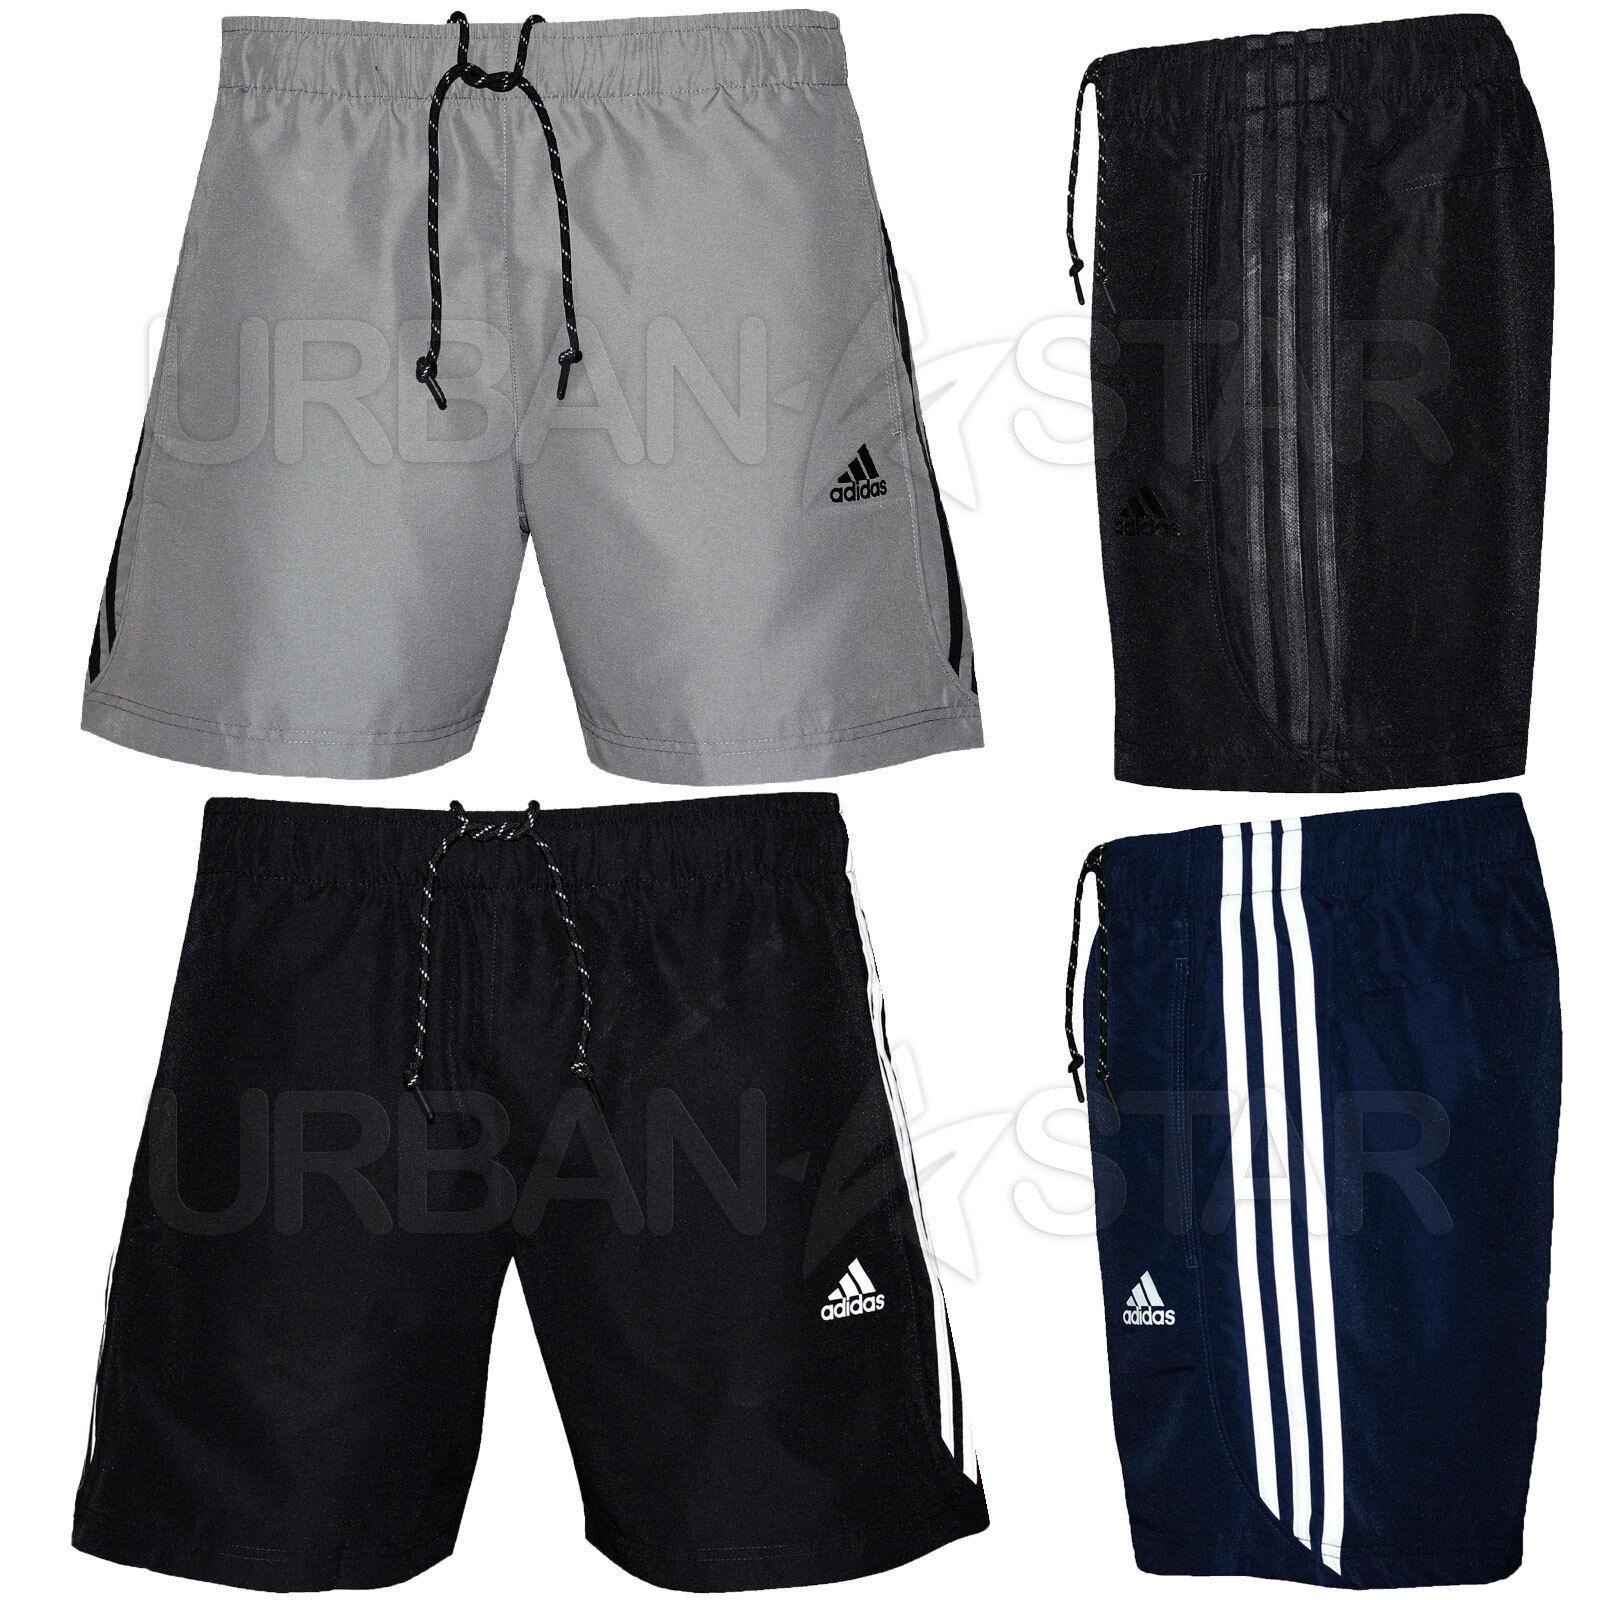 adidas Men/'s Essentials 3-Stripes Chelsea Shorts Black//Black